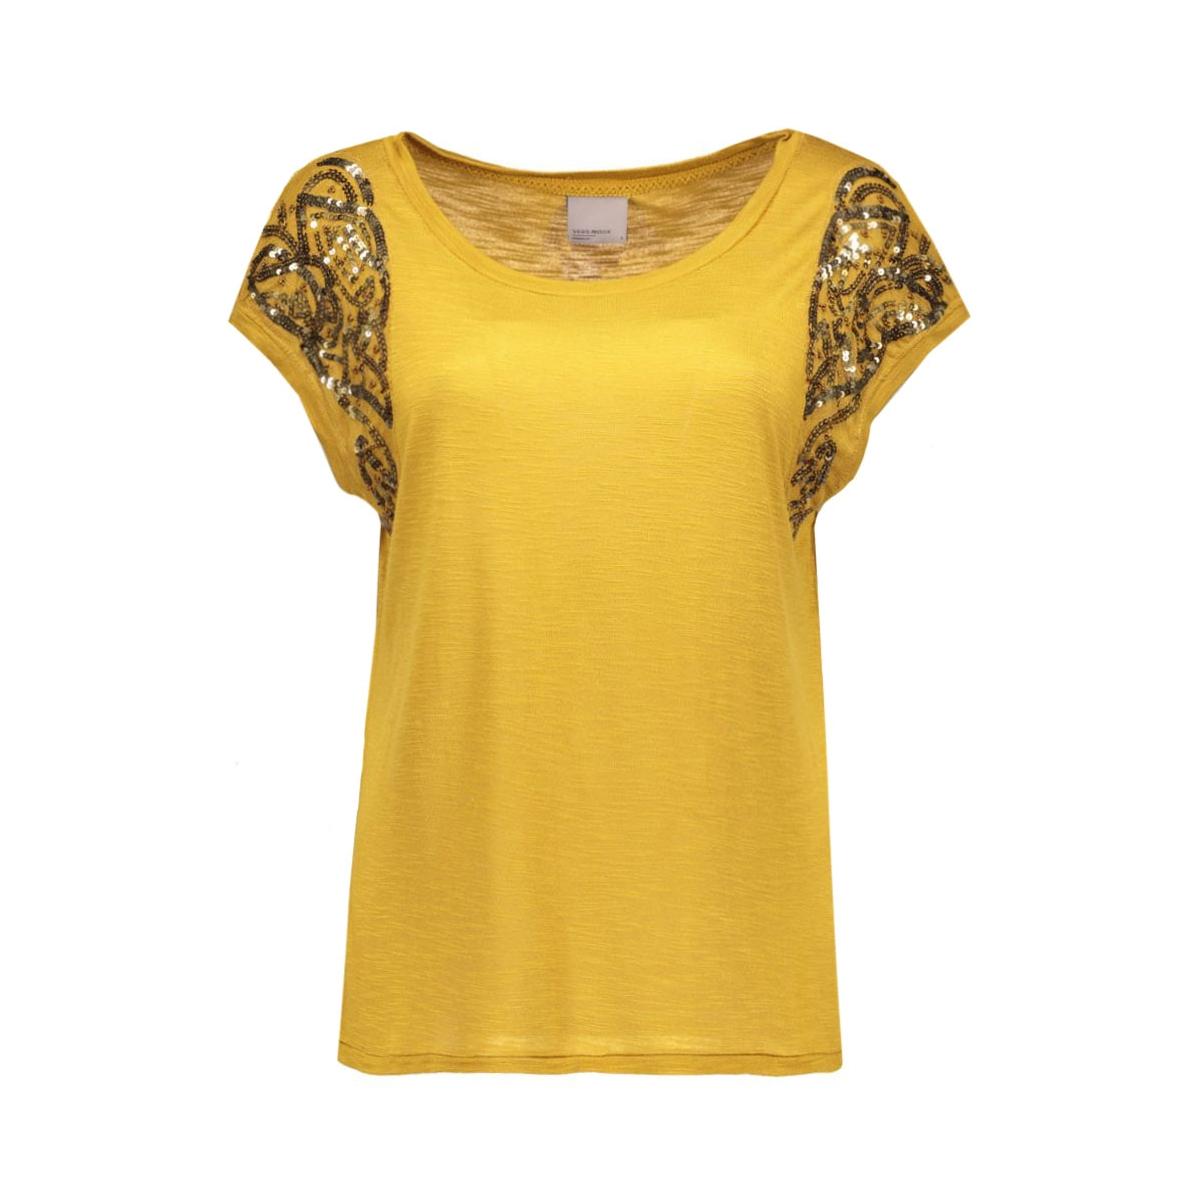 vmtinna s/s top jrs 10162238 vero moda t-shirt harves gold